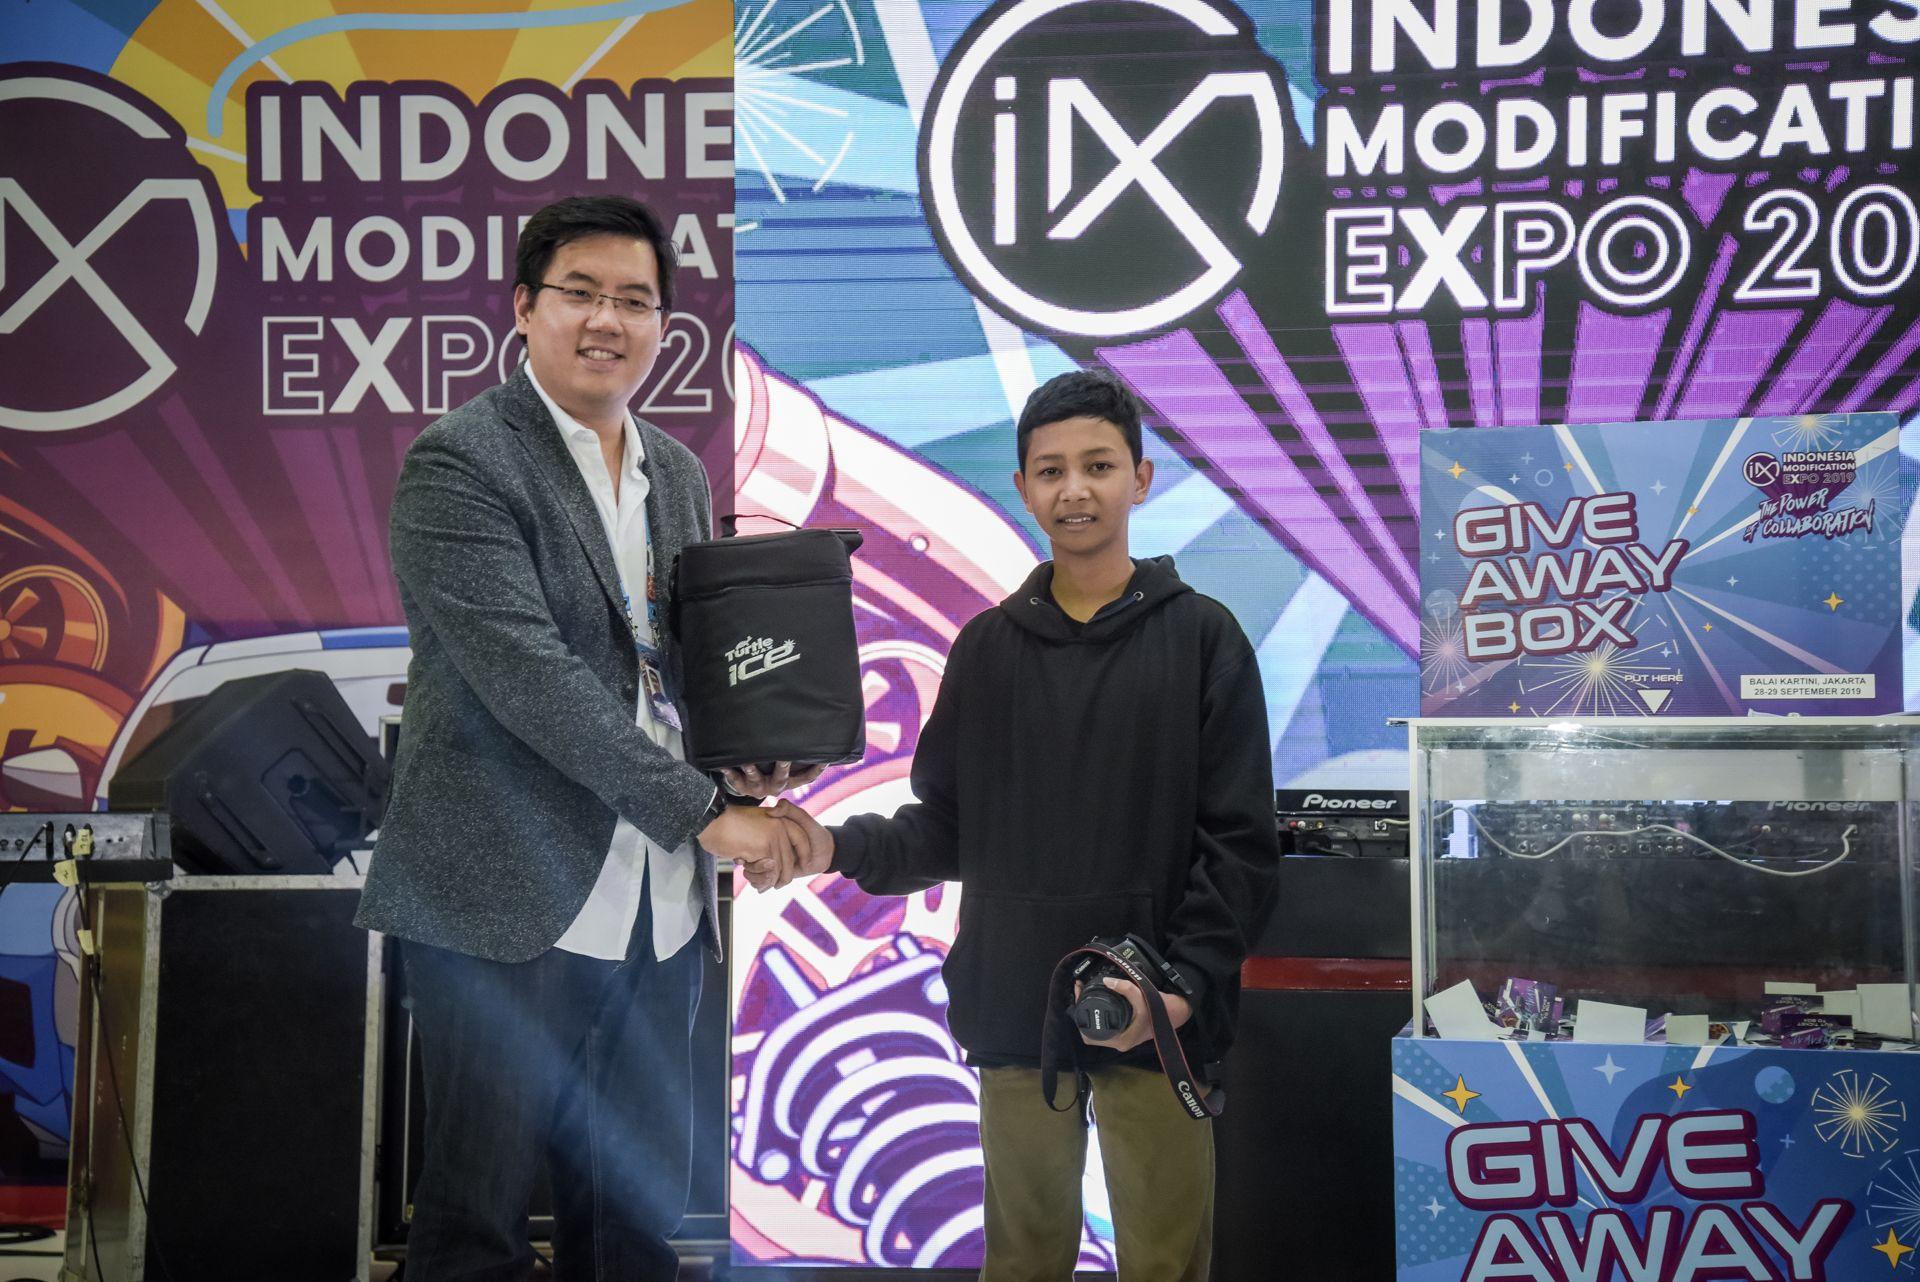 Imx giveaway (3)